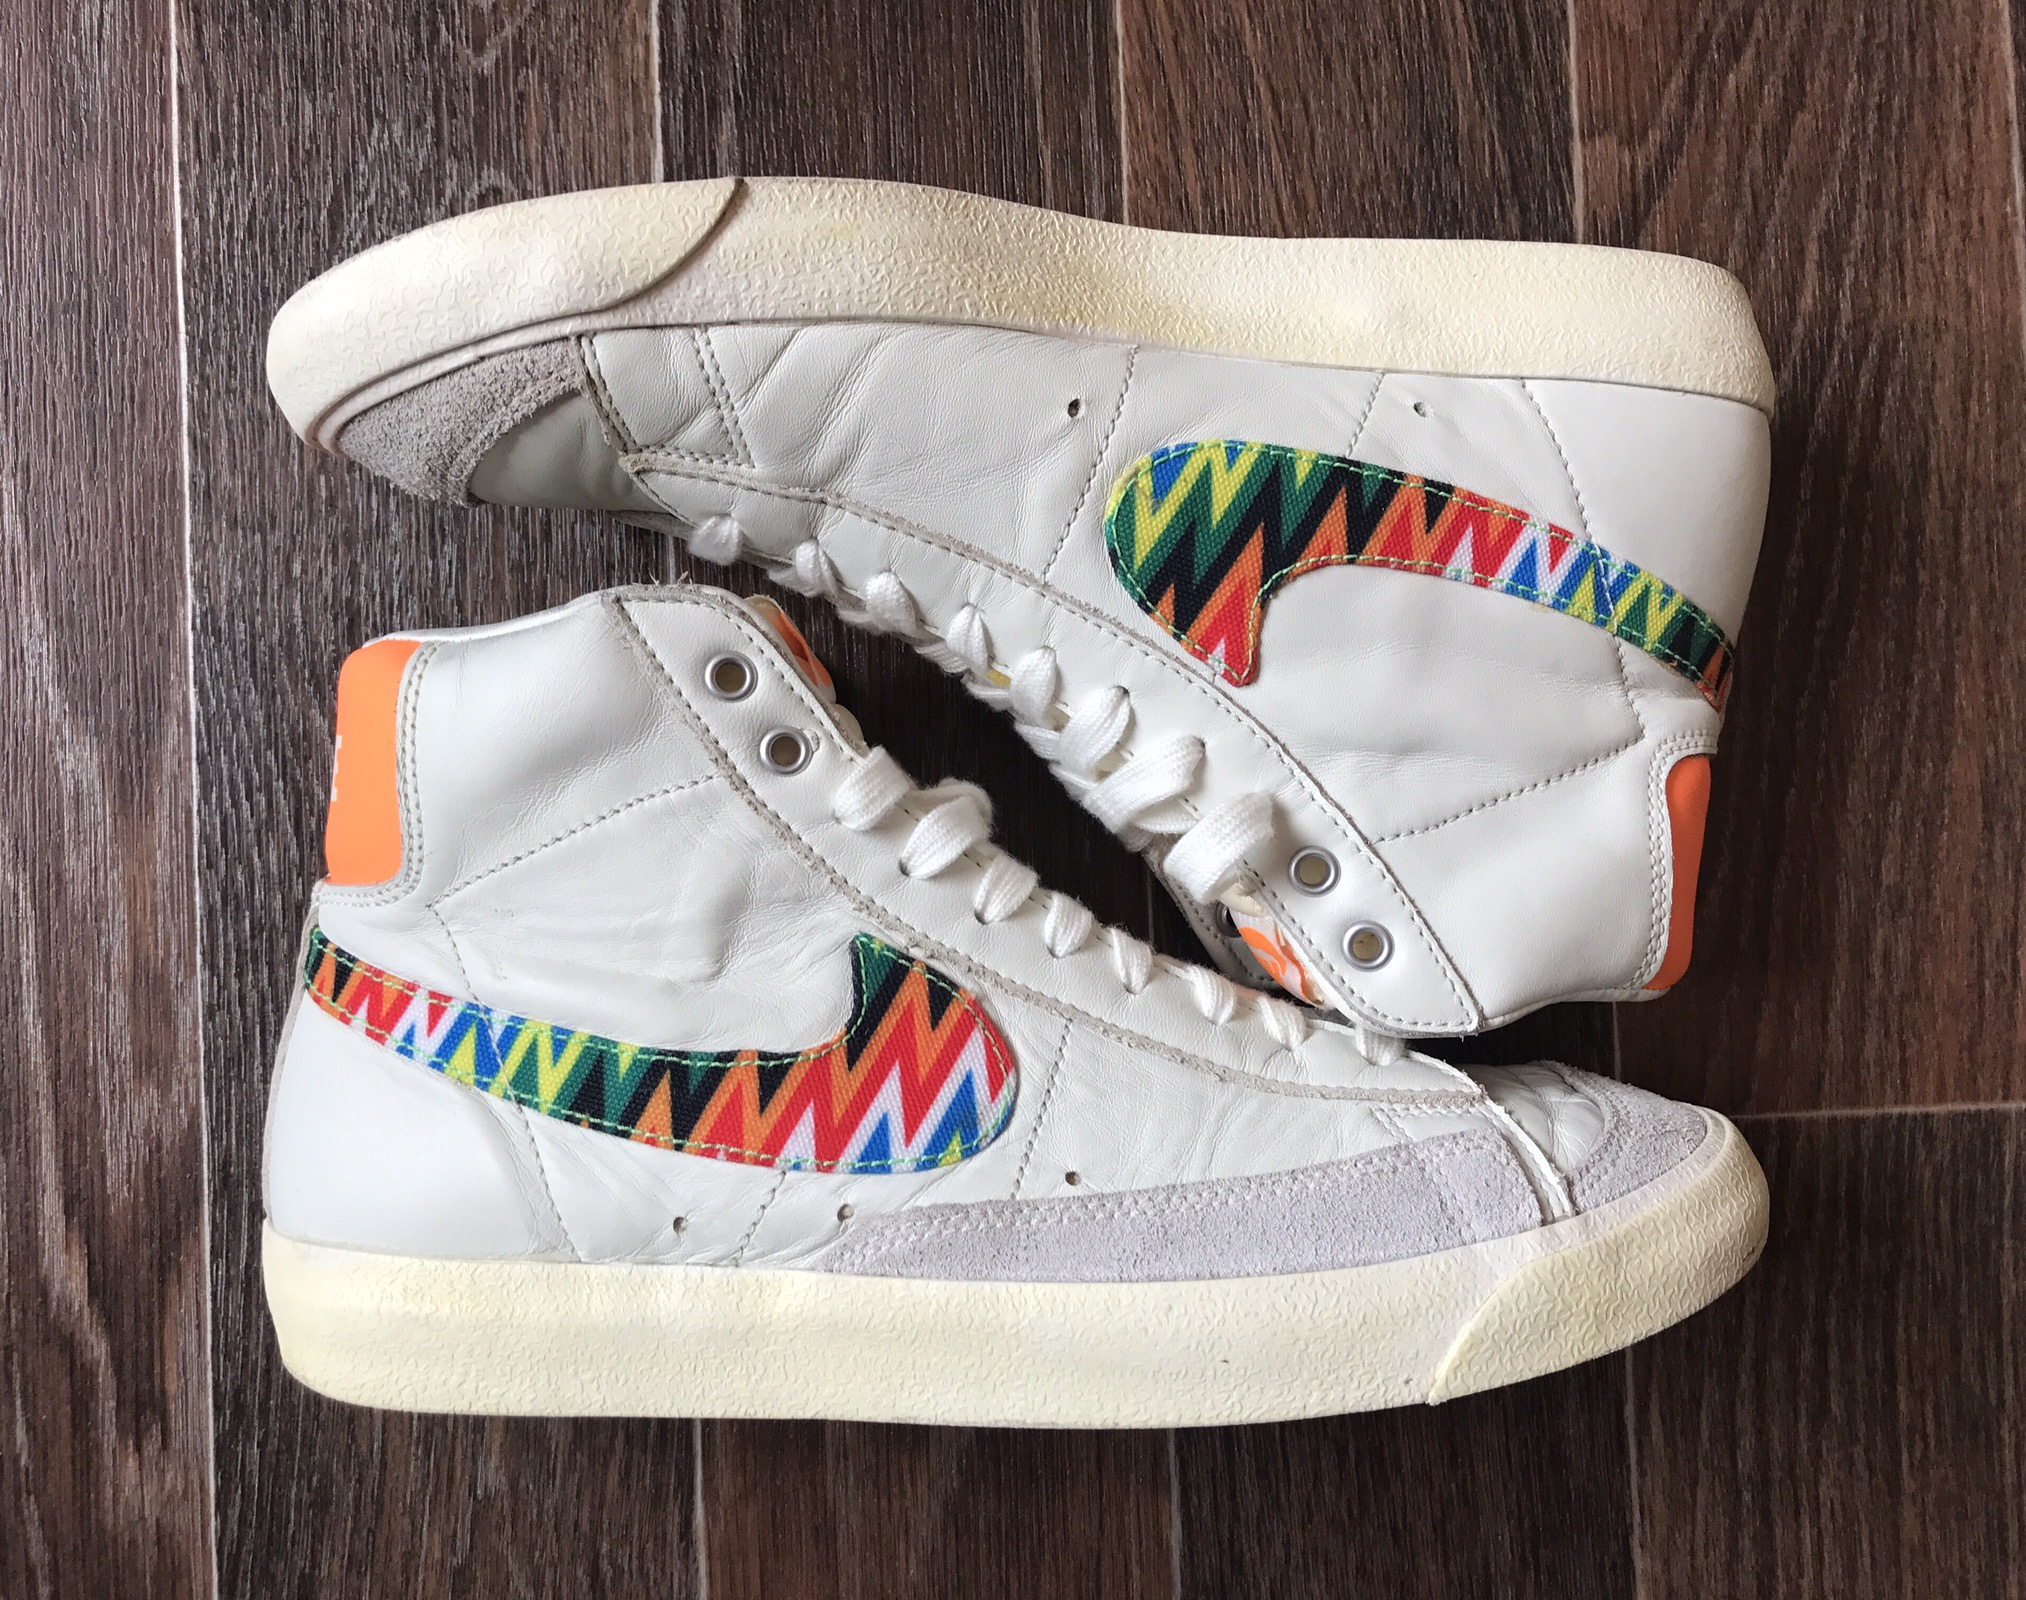 designer fashion 52f0a e0b0a Nike Blazer Zig-Zag Mid 77 Size 8 - Hi-Top Sneakers for Sale